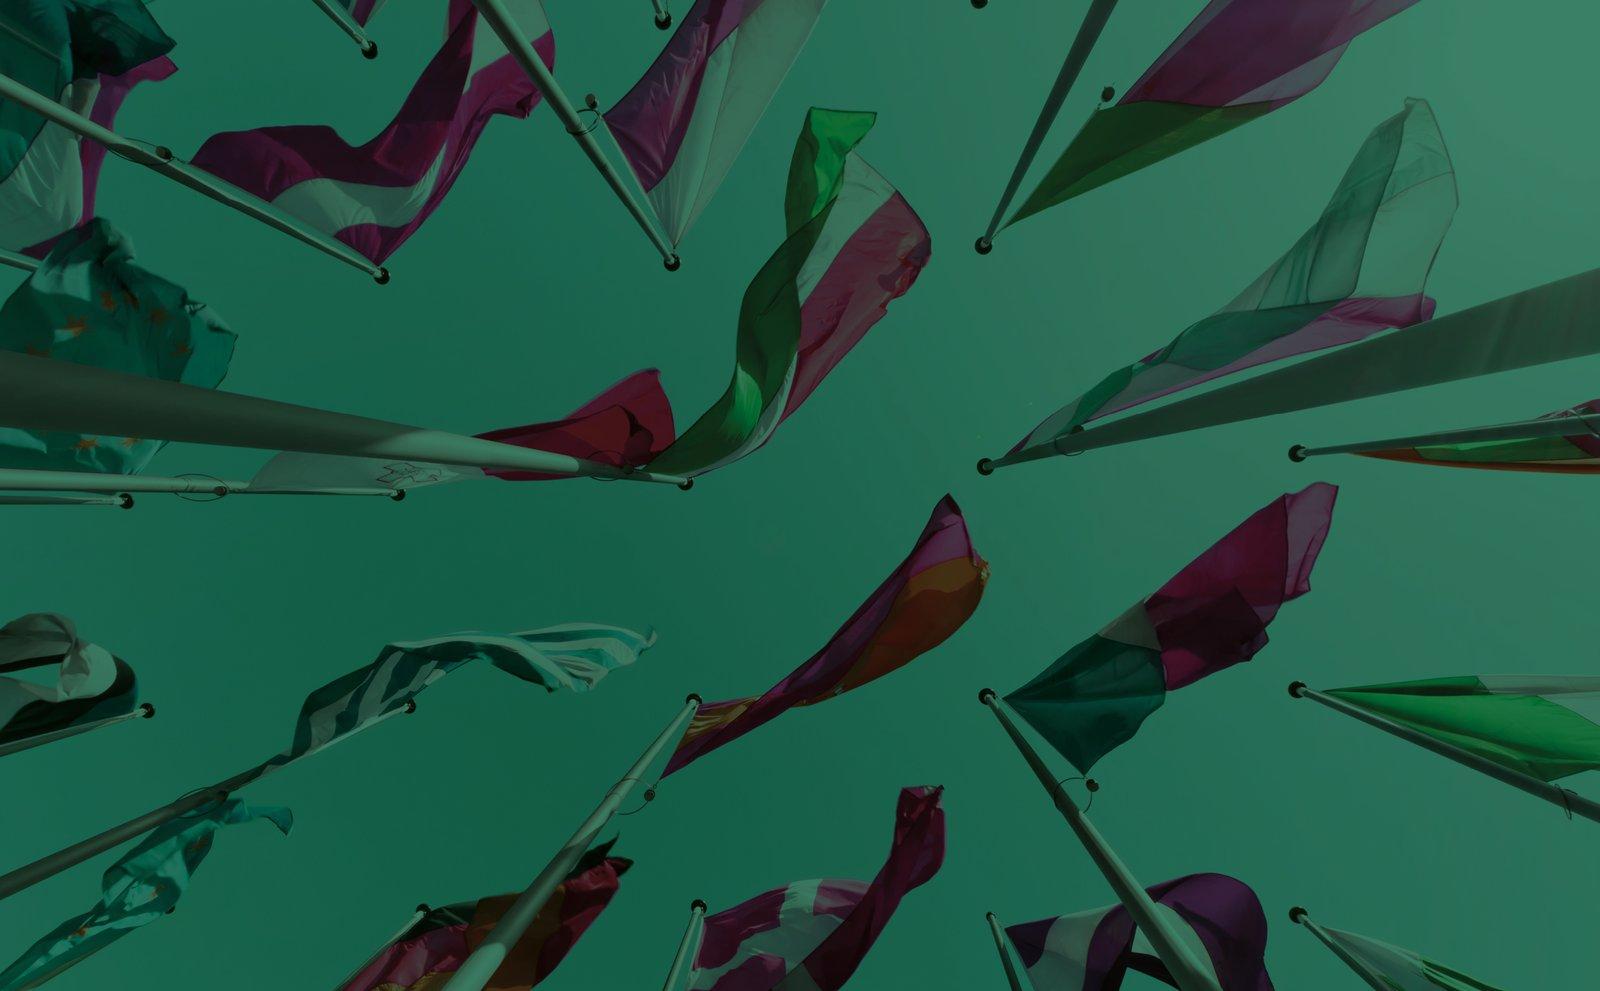 2019-Insead-LP-Background-Large